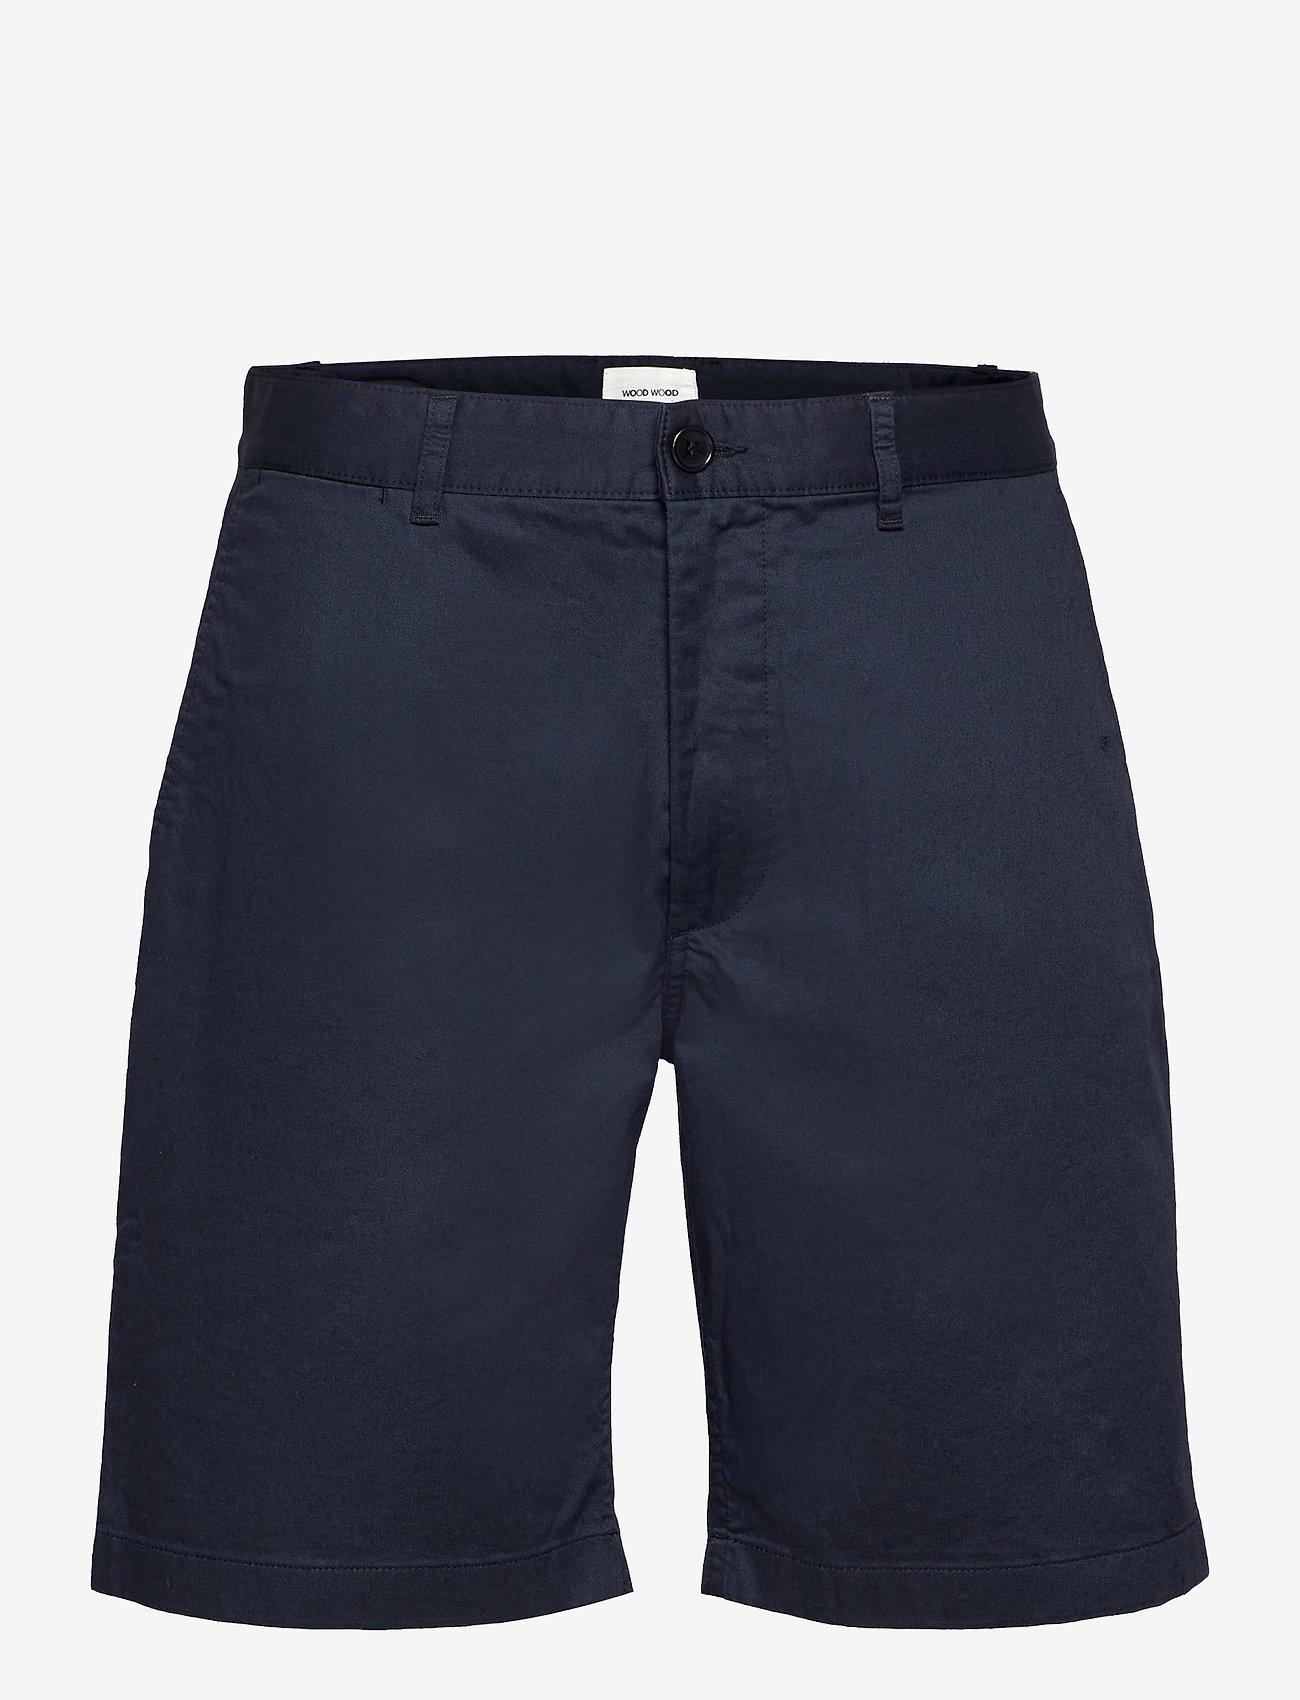 Wood Wood - Jonathan light twill shorts - chino's shorts - navy - 0